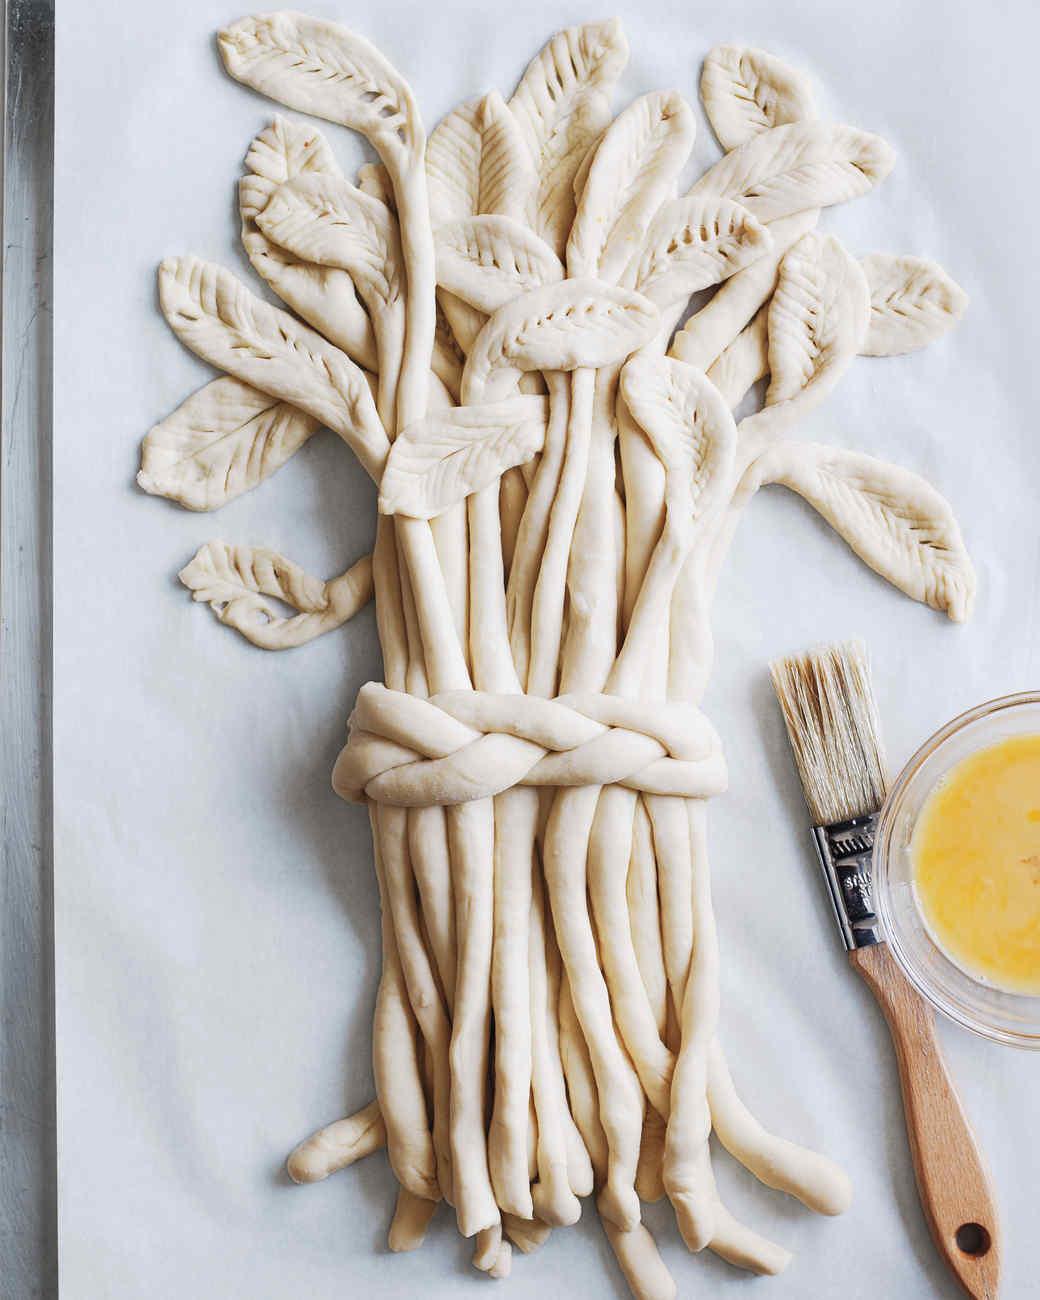 sheath-bread-how-to-11-d112409.jpg